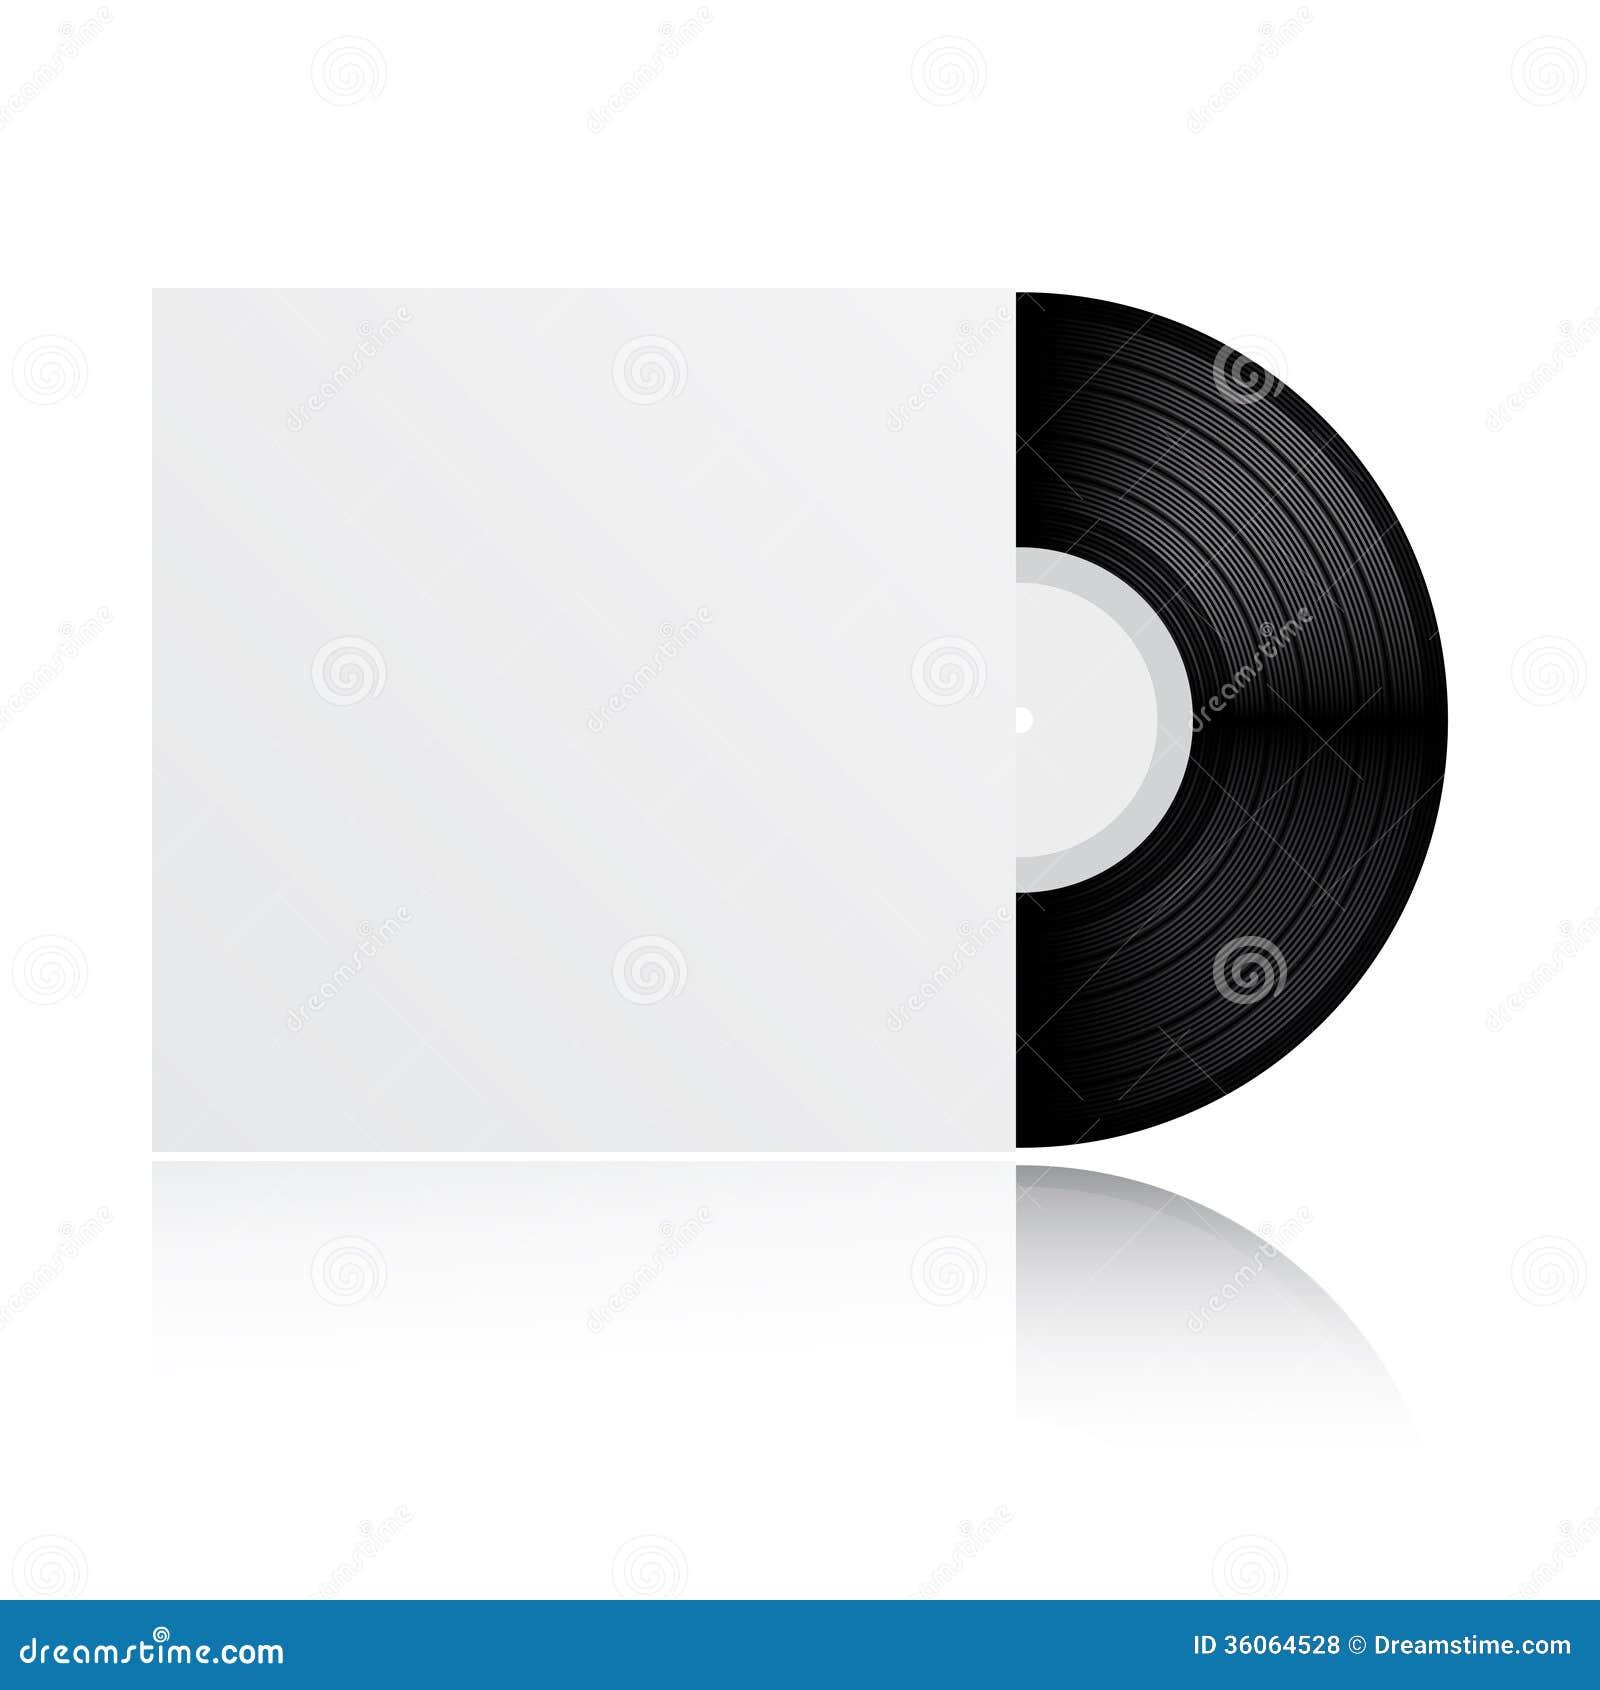 Blank White Vinyl Cover Stock Images - Image: 32074804